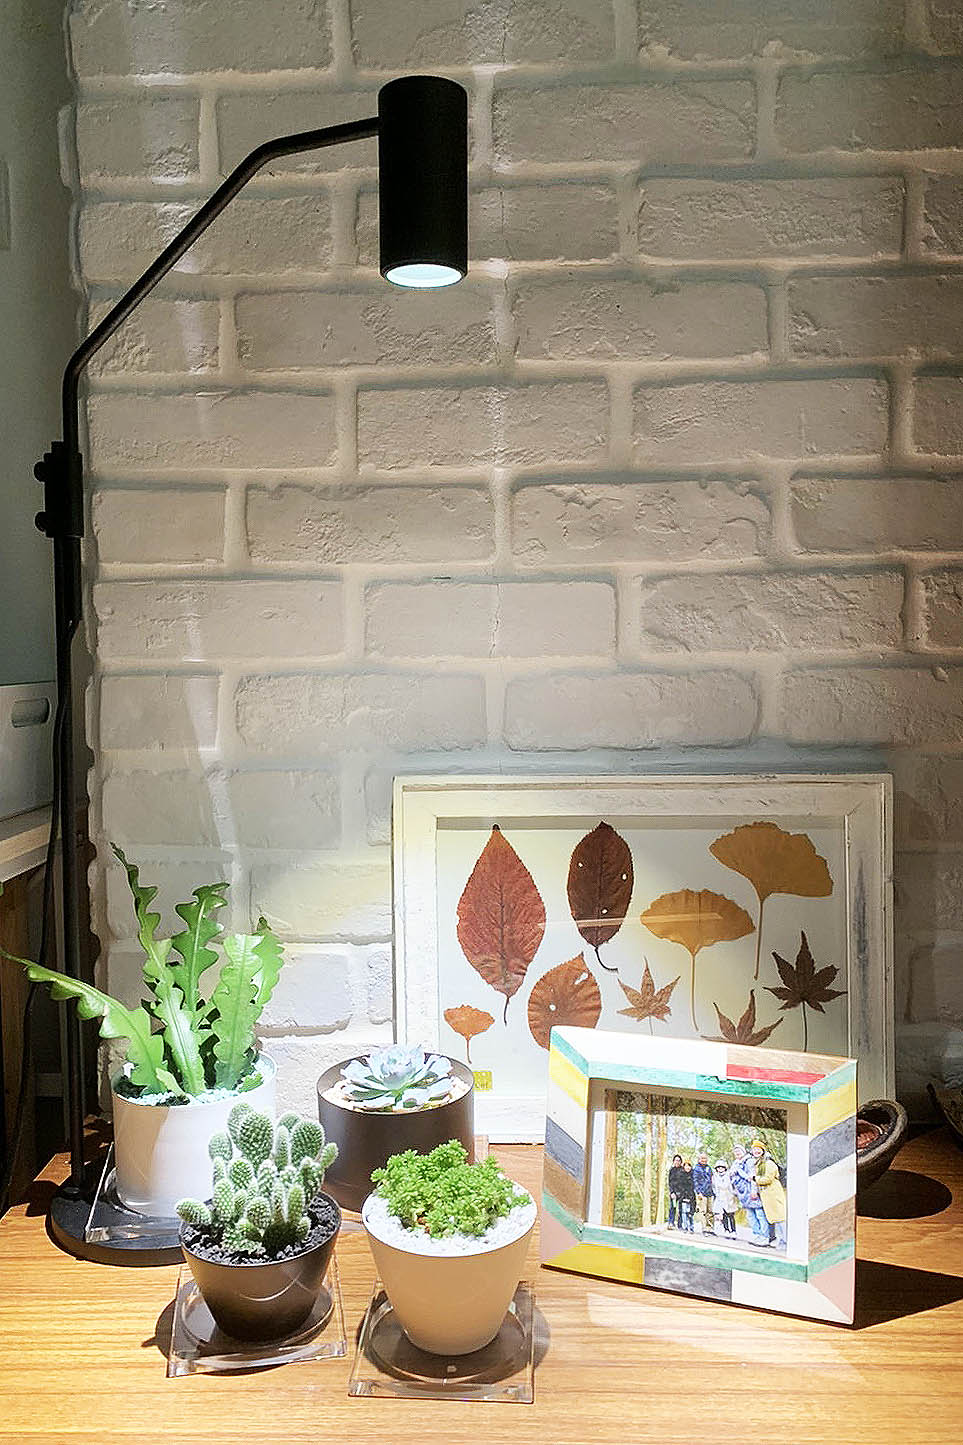 OURA 室內植物燈 - 桌燈 OURA17